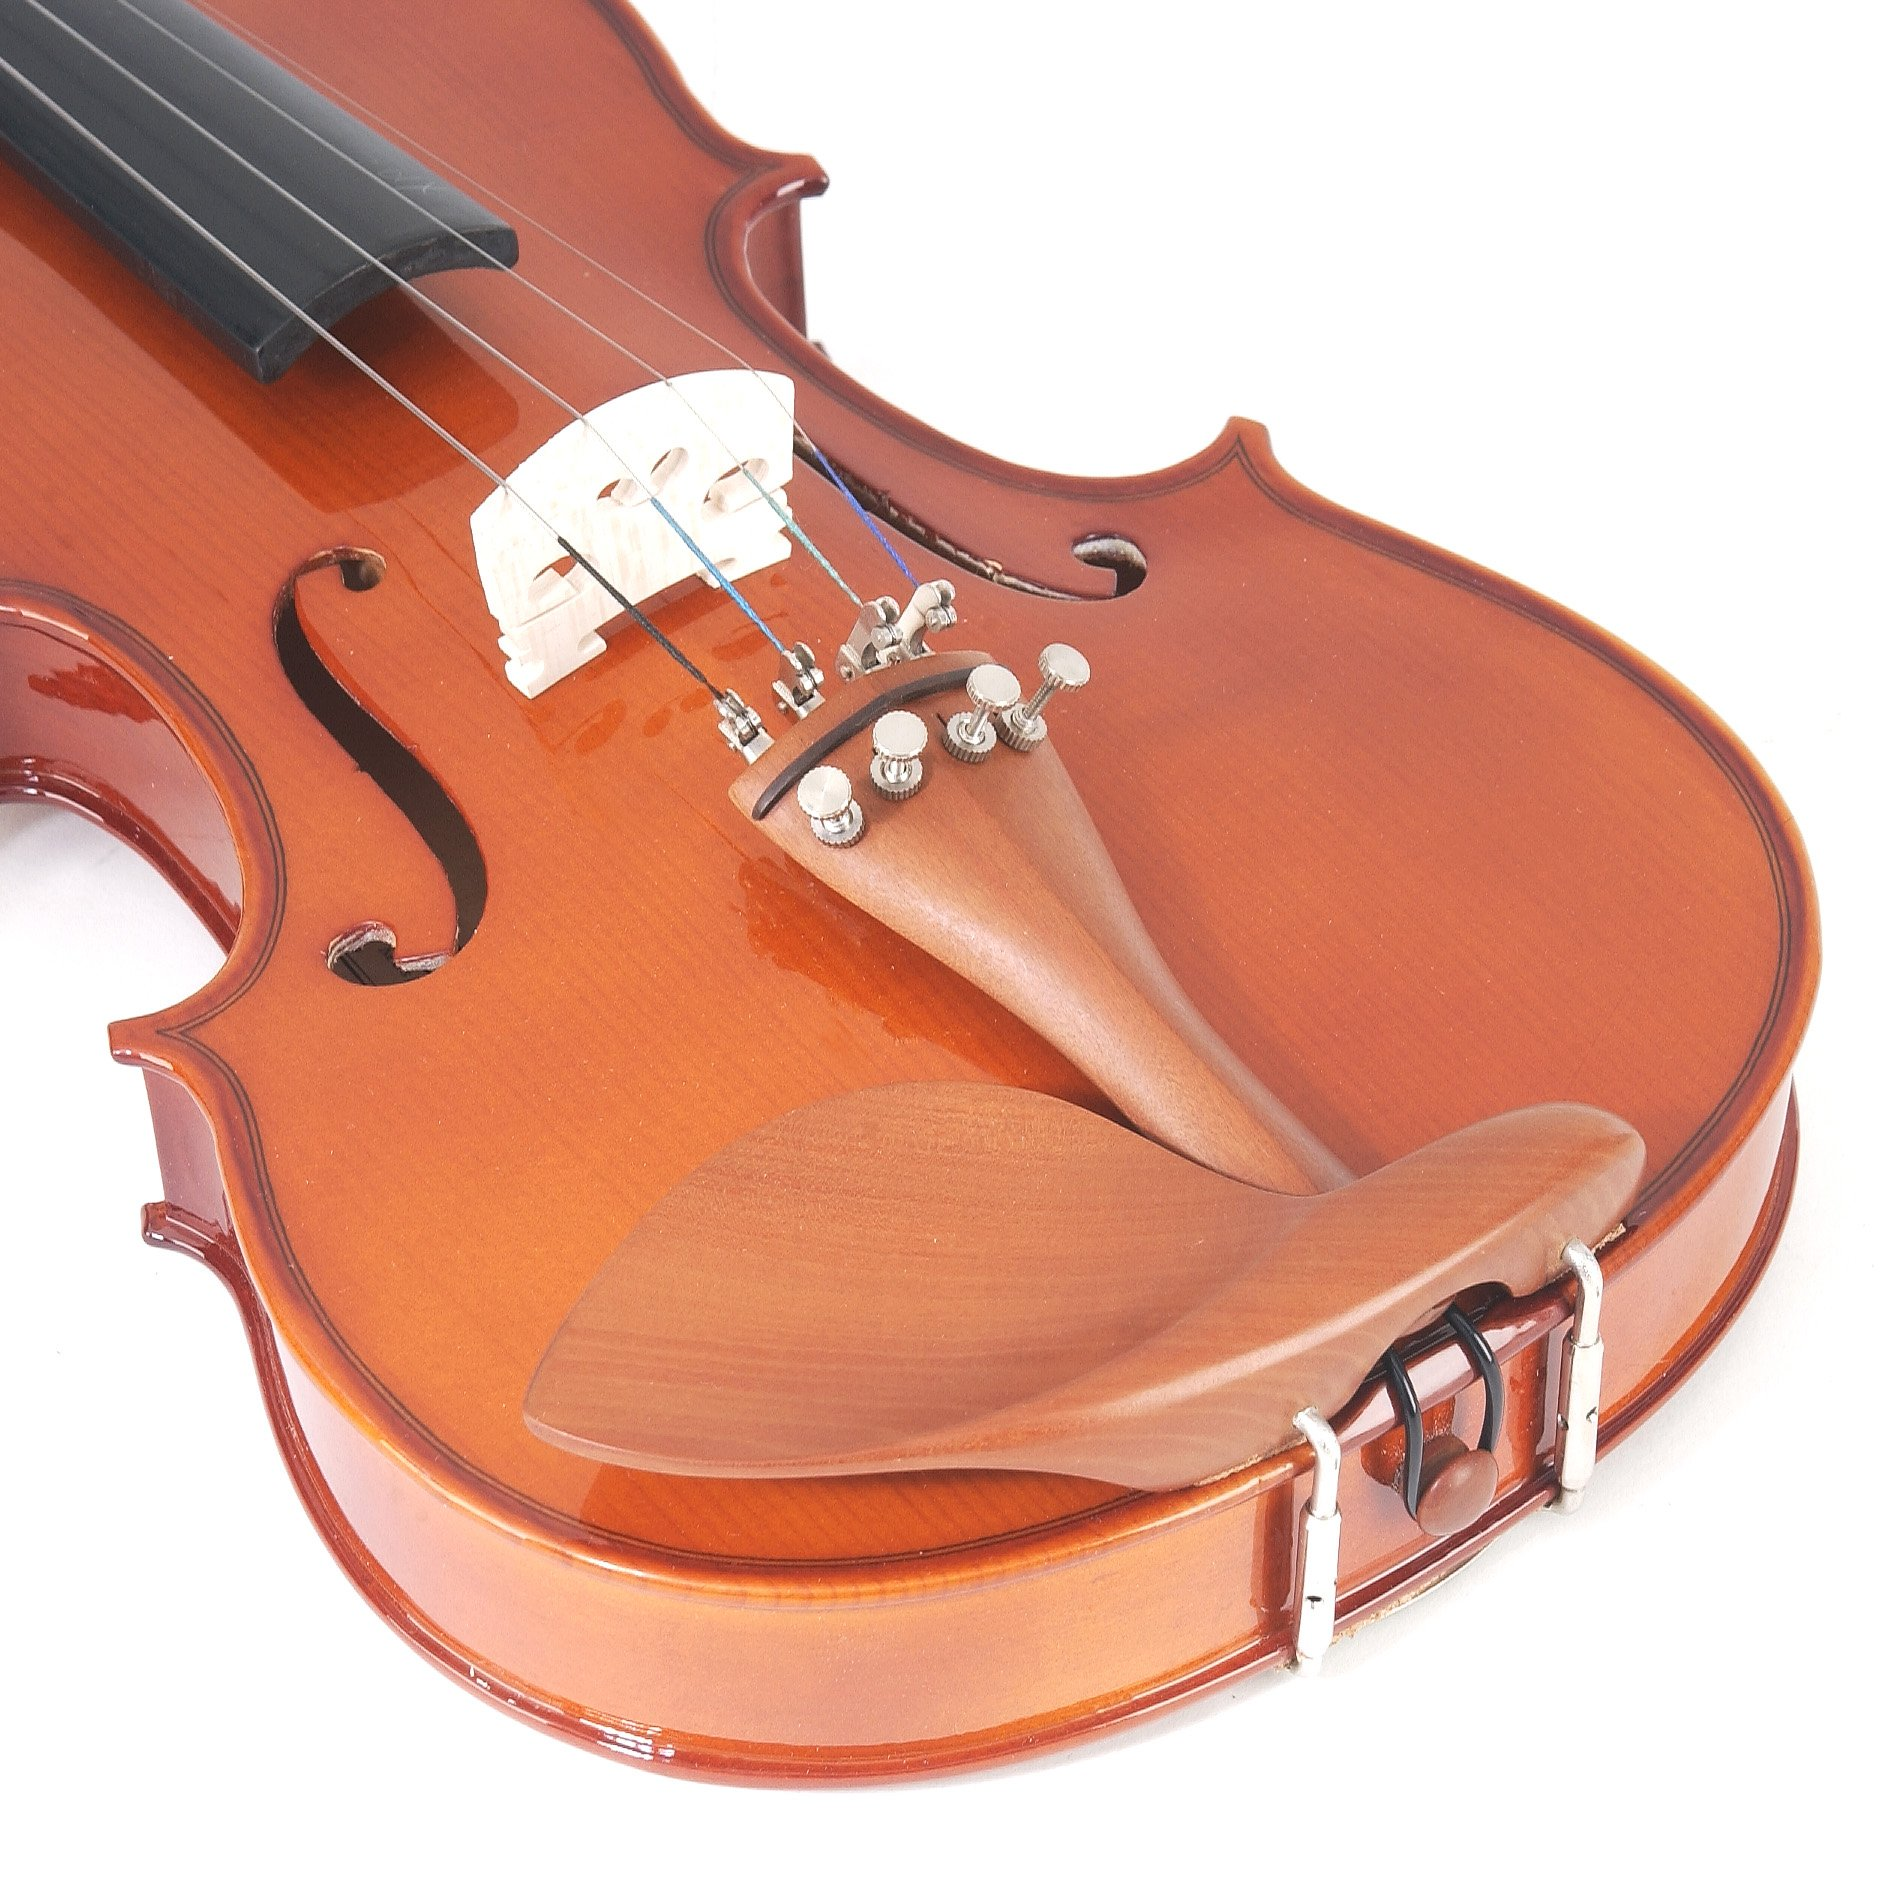 Cecilio CVN-200 Solidwood Violin with D'Addario Prelude Strings, Size 4/4 (Full Size) by Cecilio (Image #5)